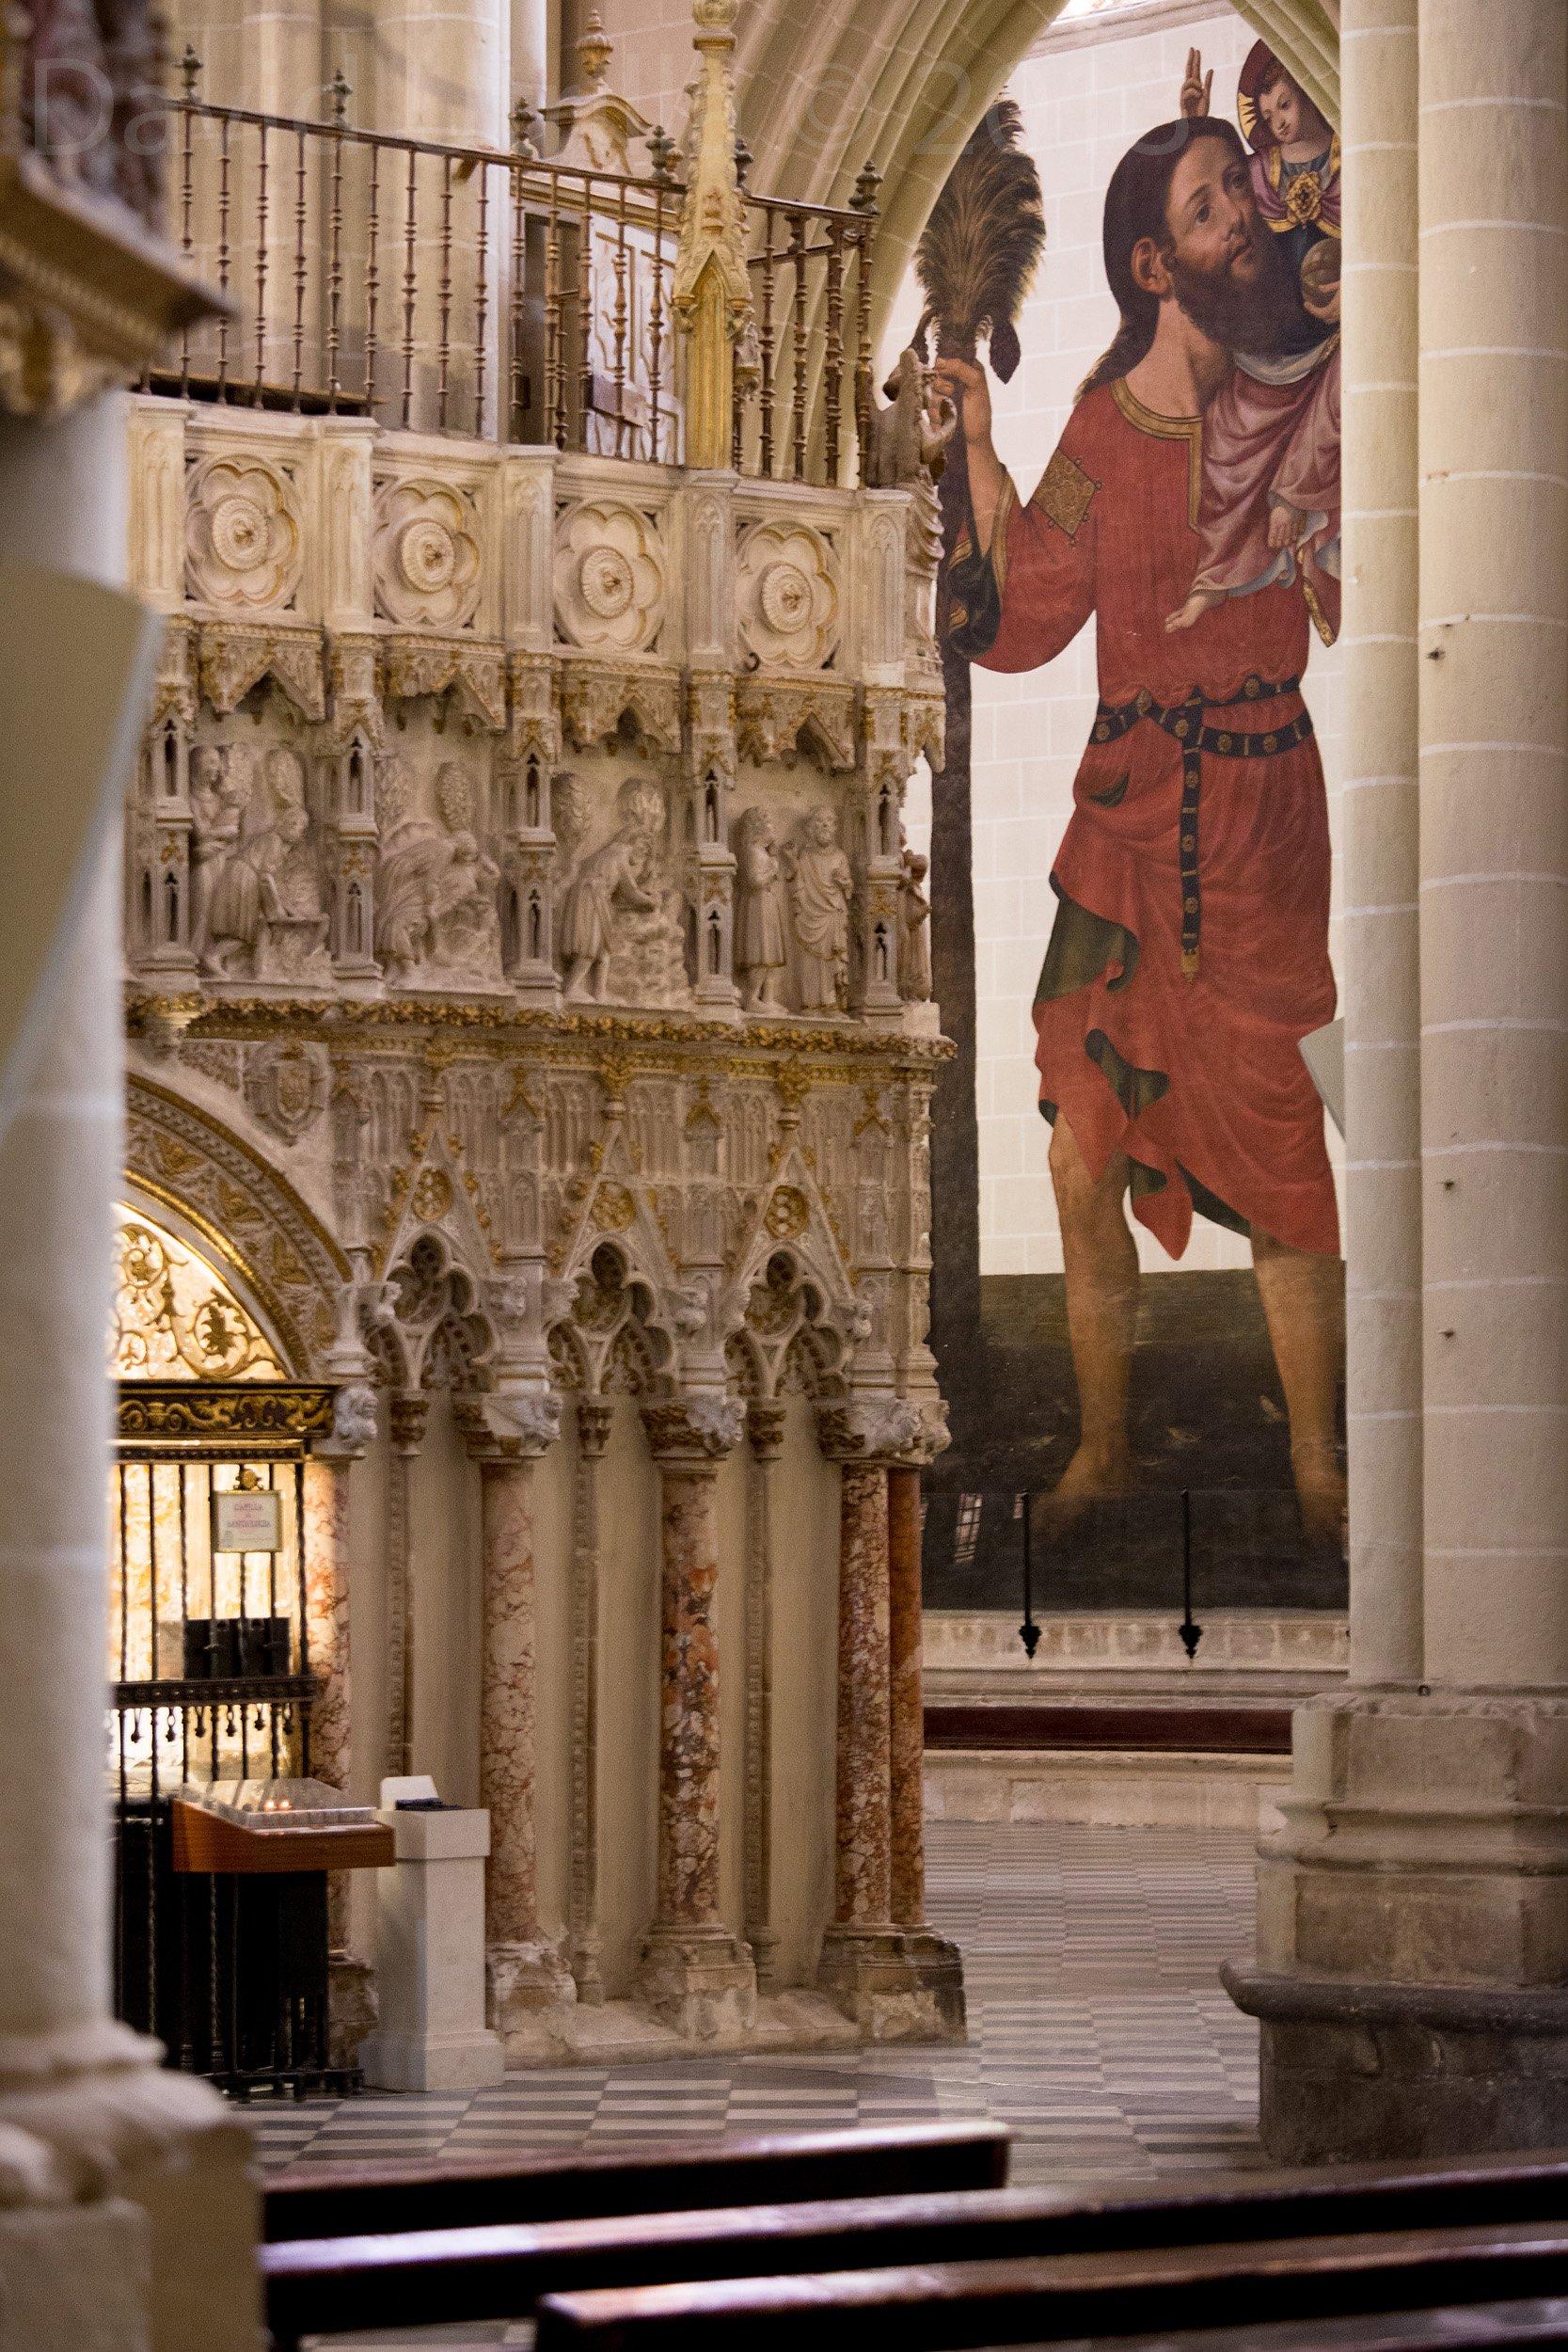 Pintura al fresco de Gabriel Ruedas, Catedral de Toledo, 1638. Dimensiones aproximadas: 11 x 4,5 m.